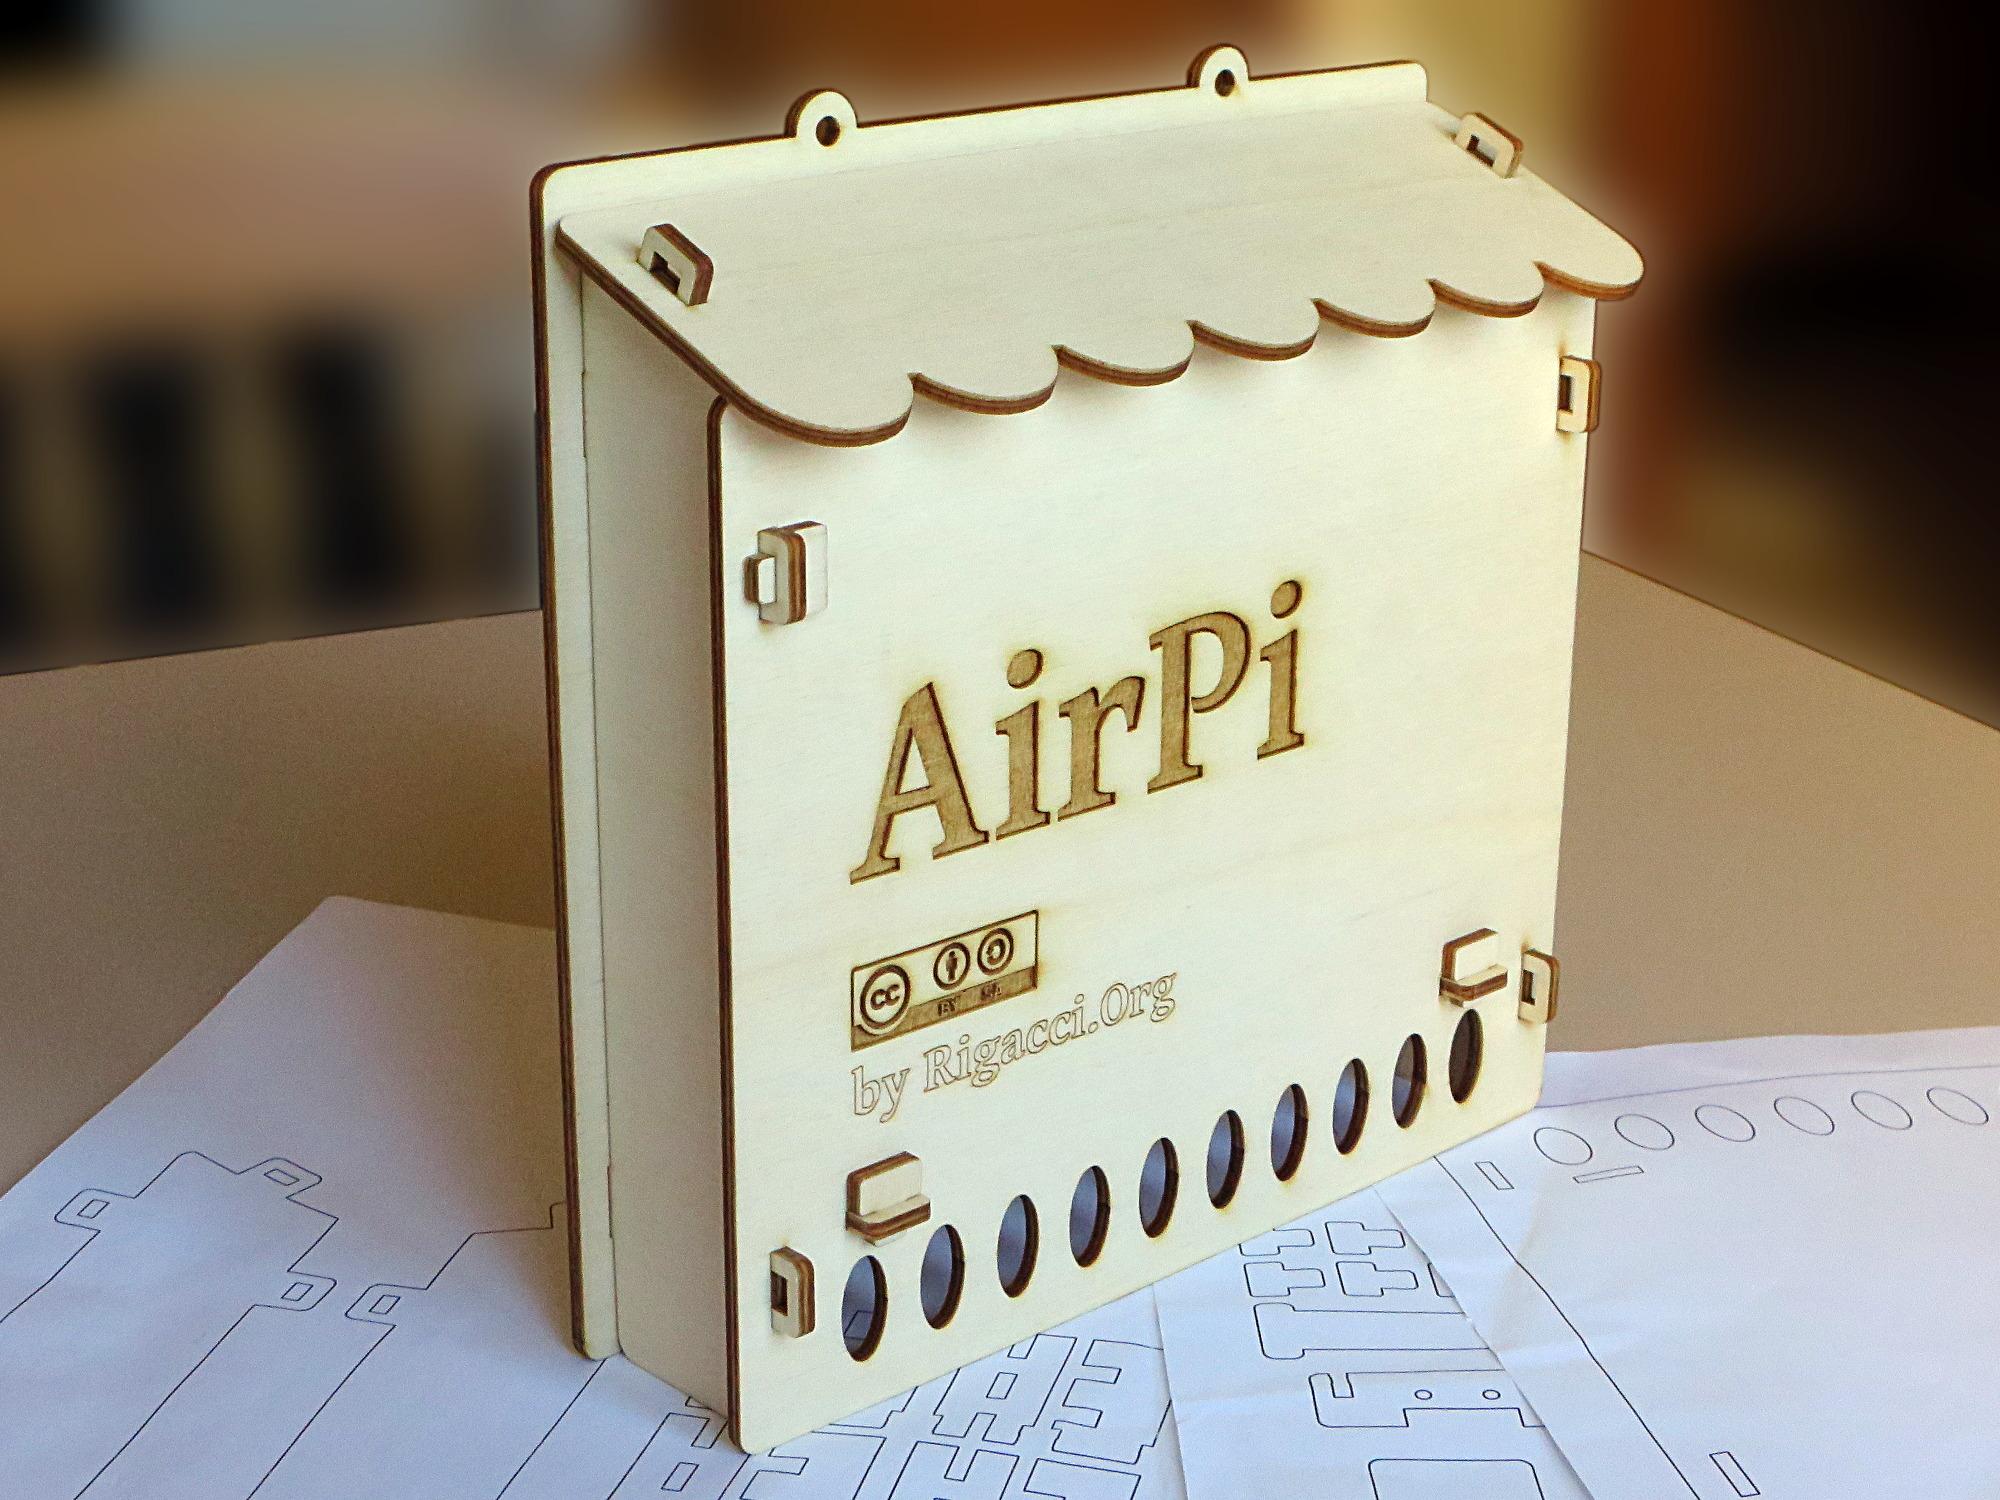 Rapsberry Pi Air Quality Station [rigacci org]